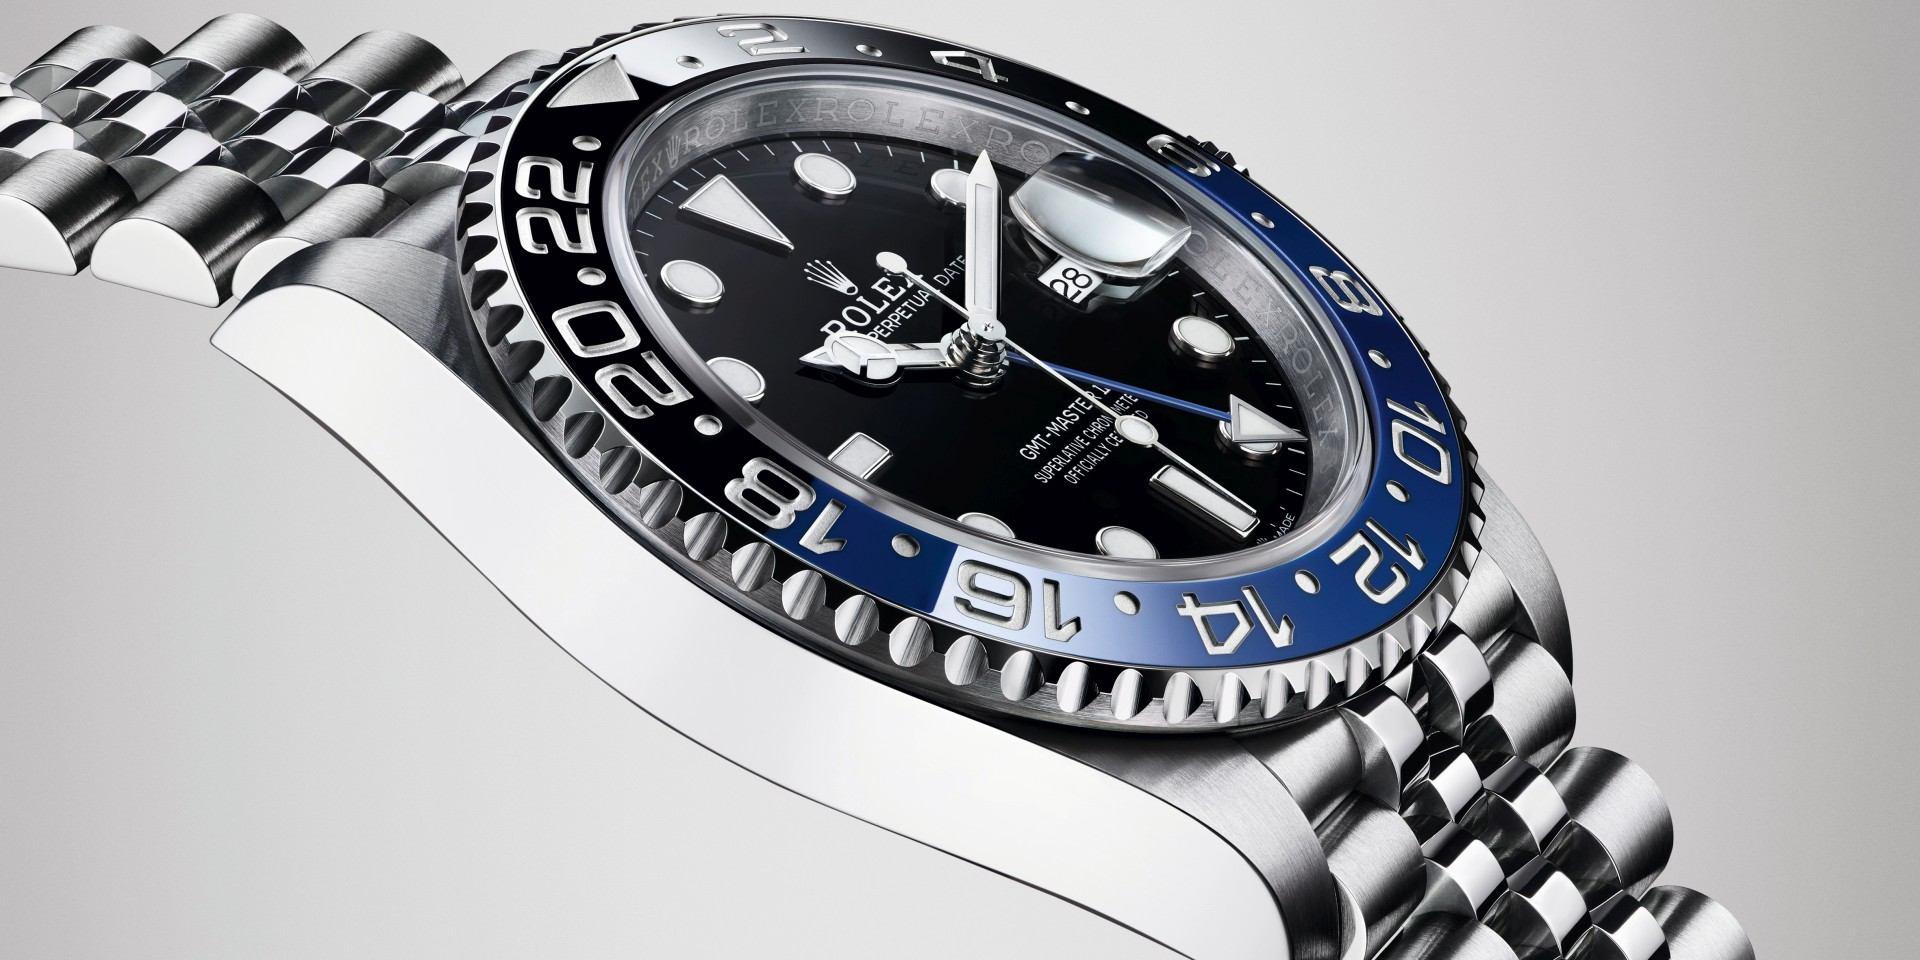 【2019 BASEL錶展報導】五分鐘秒懂勞力士2019年巴塞爾鐘錶展新作